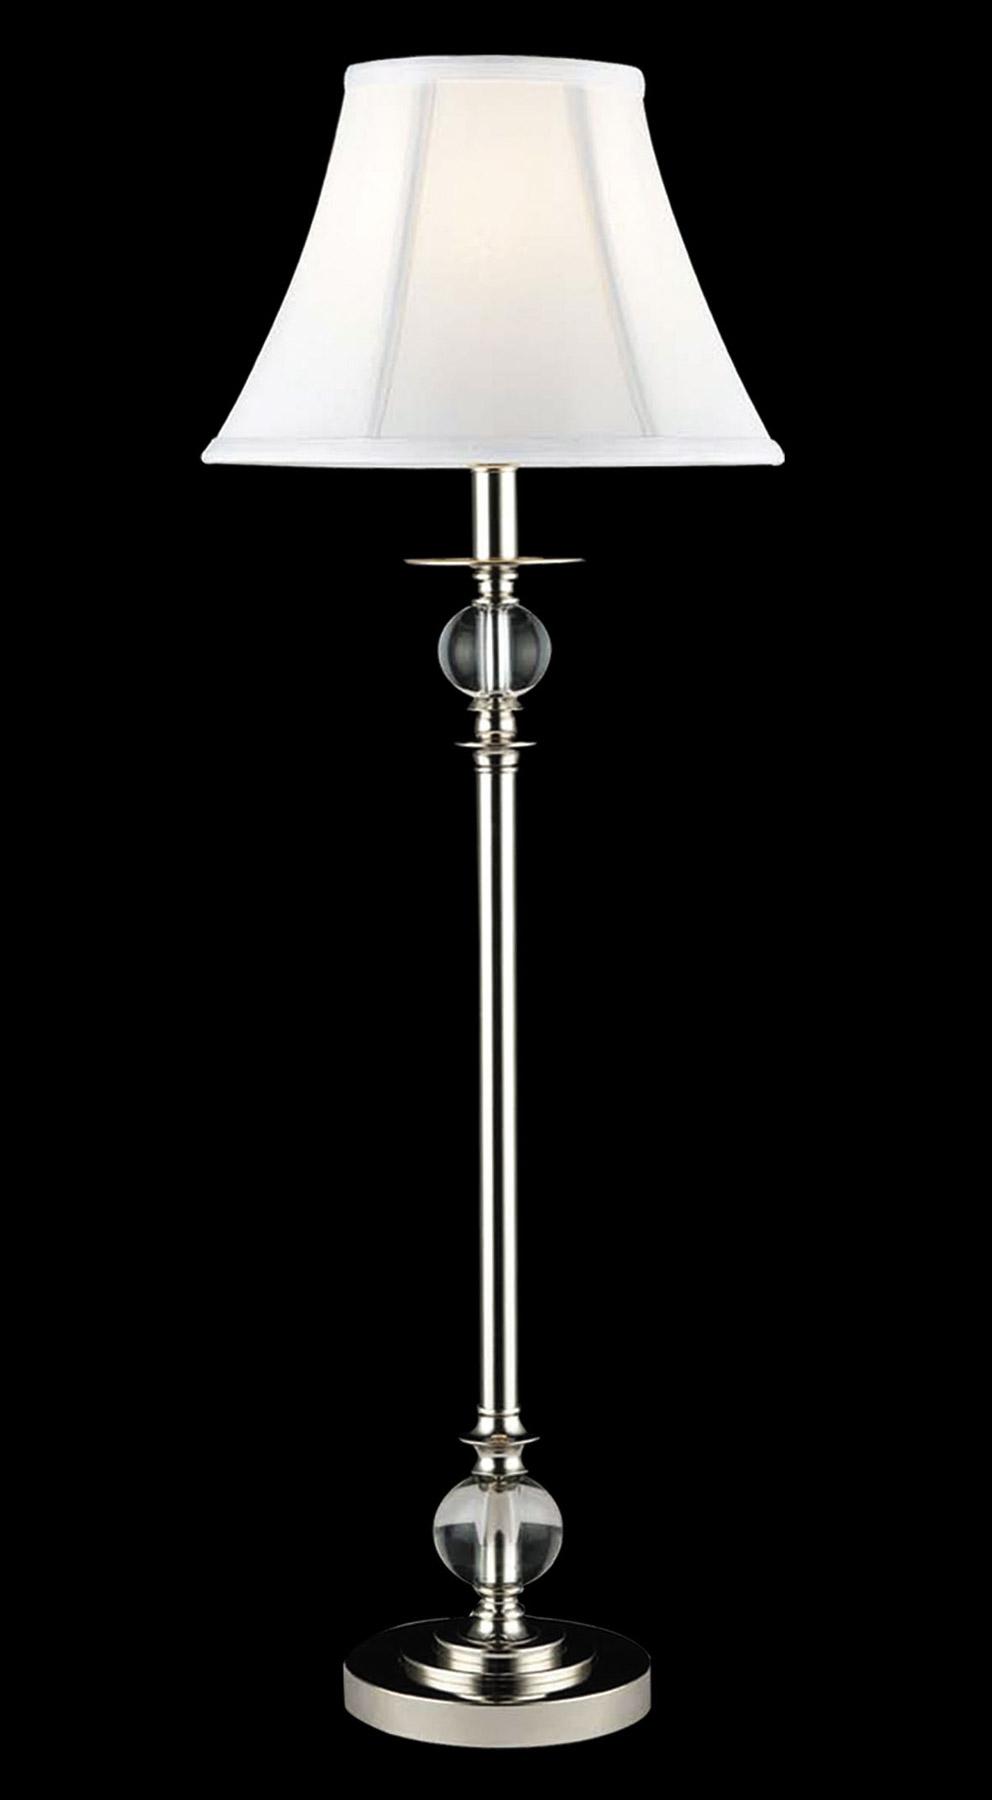 dale tiffany gb10196 crystal buffet lamp. Black Bedroom Furniture Sets. Home Design Ideas